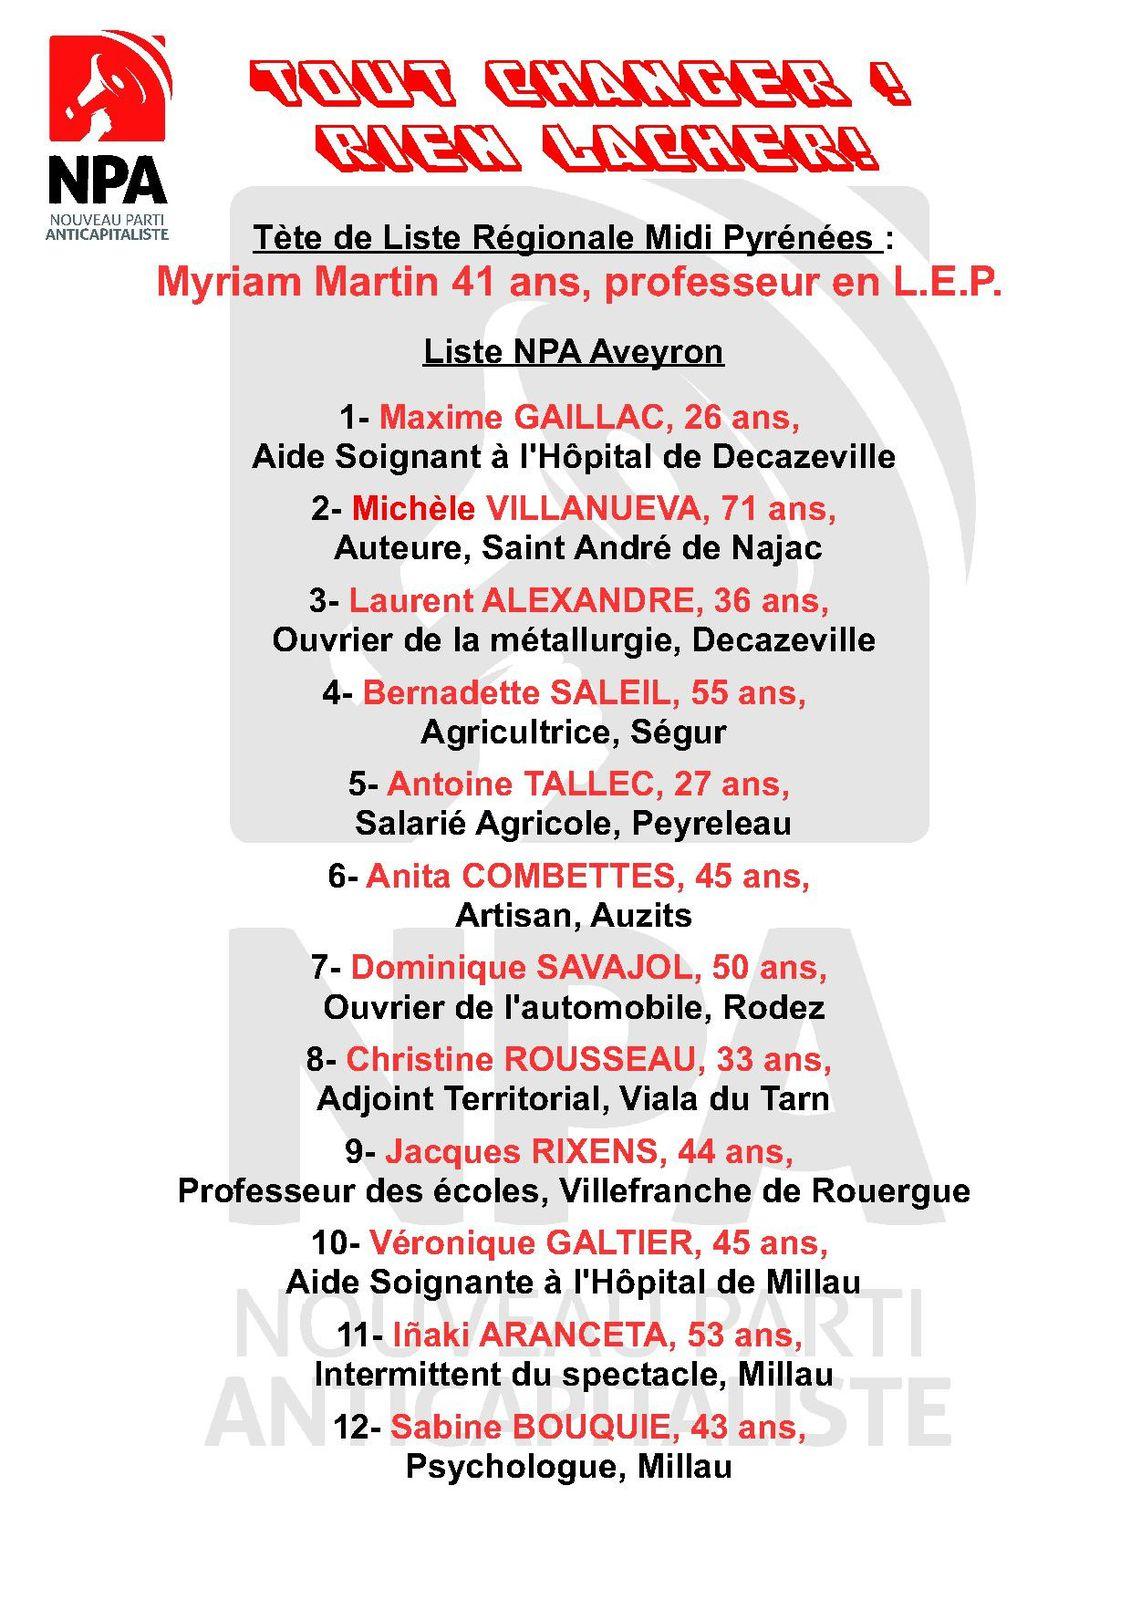 liste npa aveyron regionales 2010